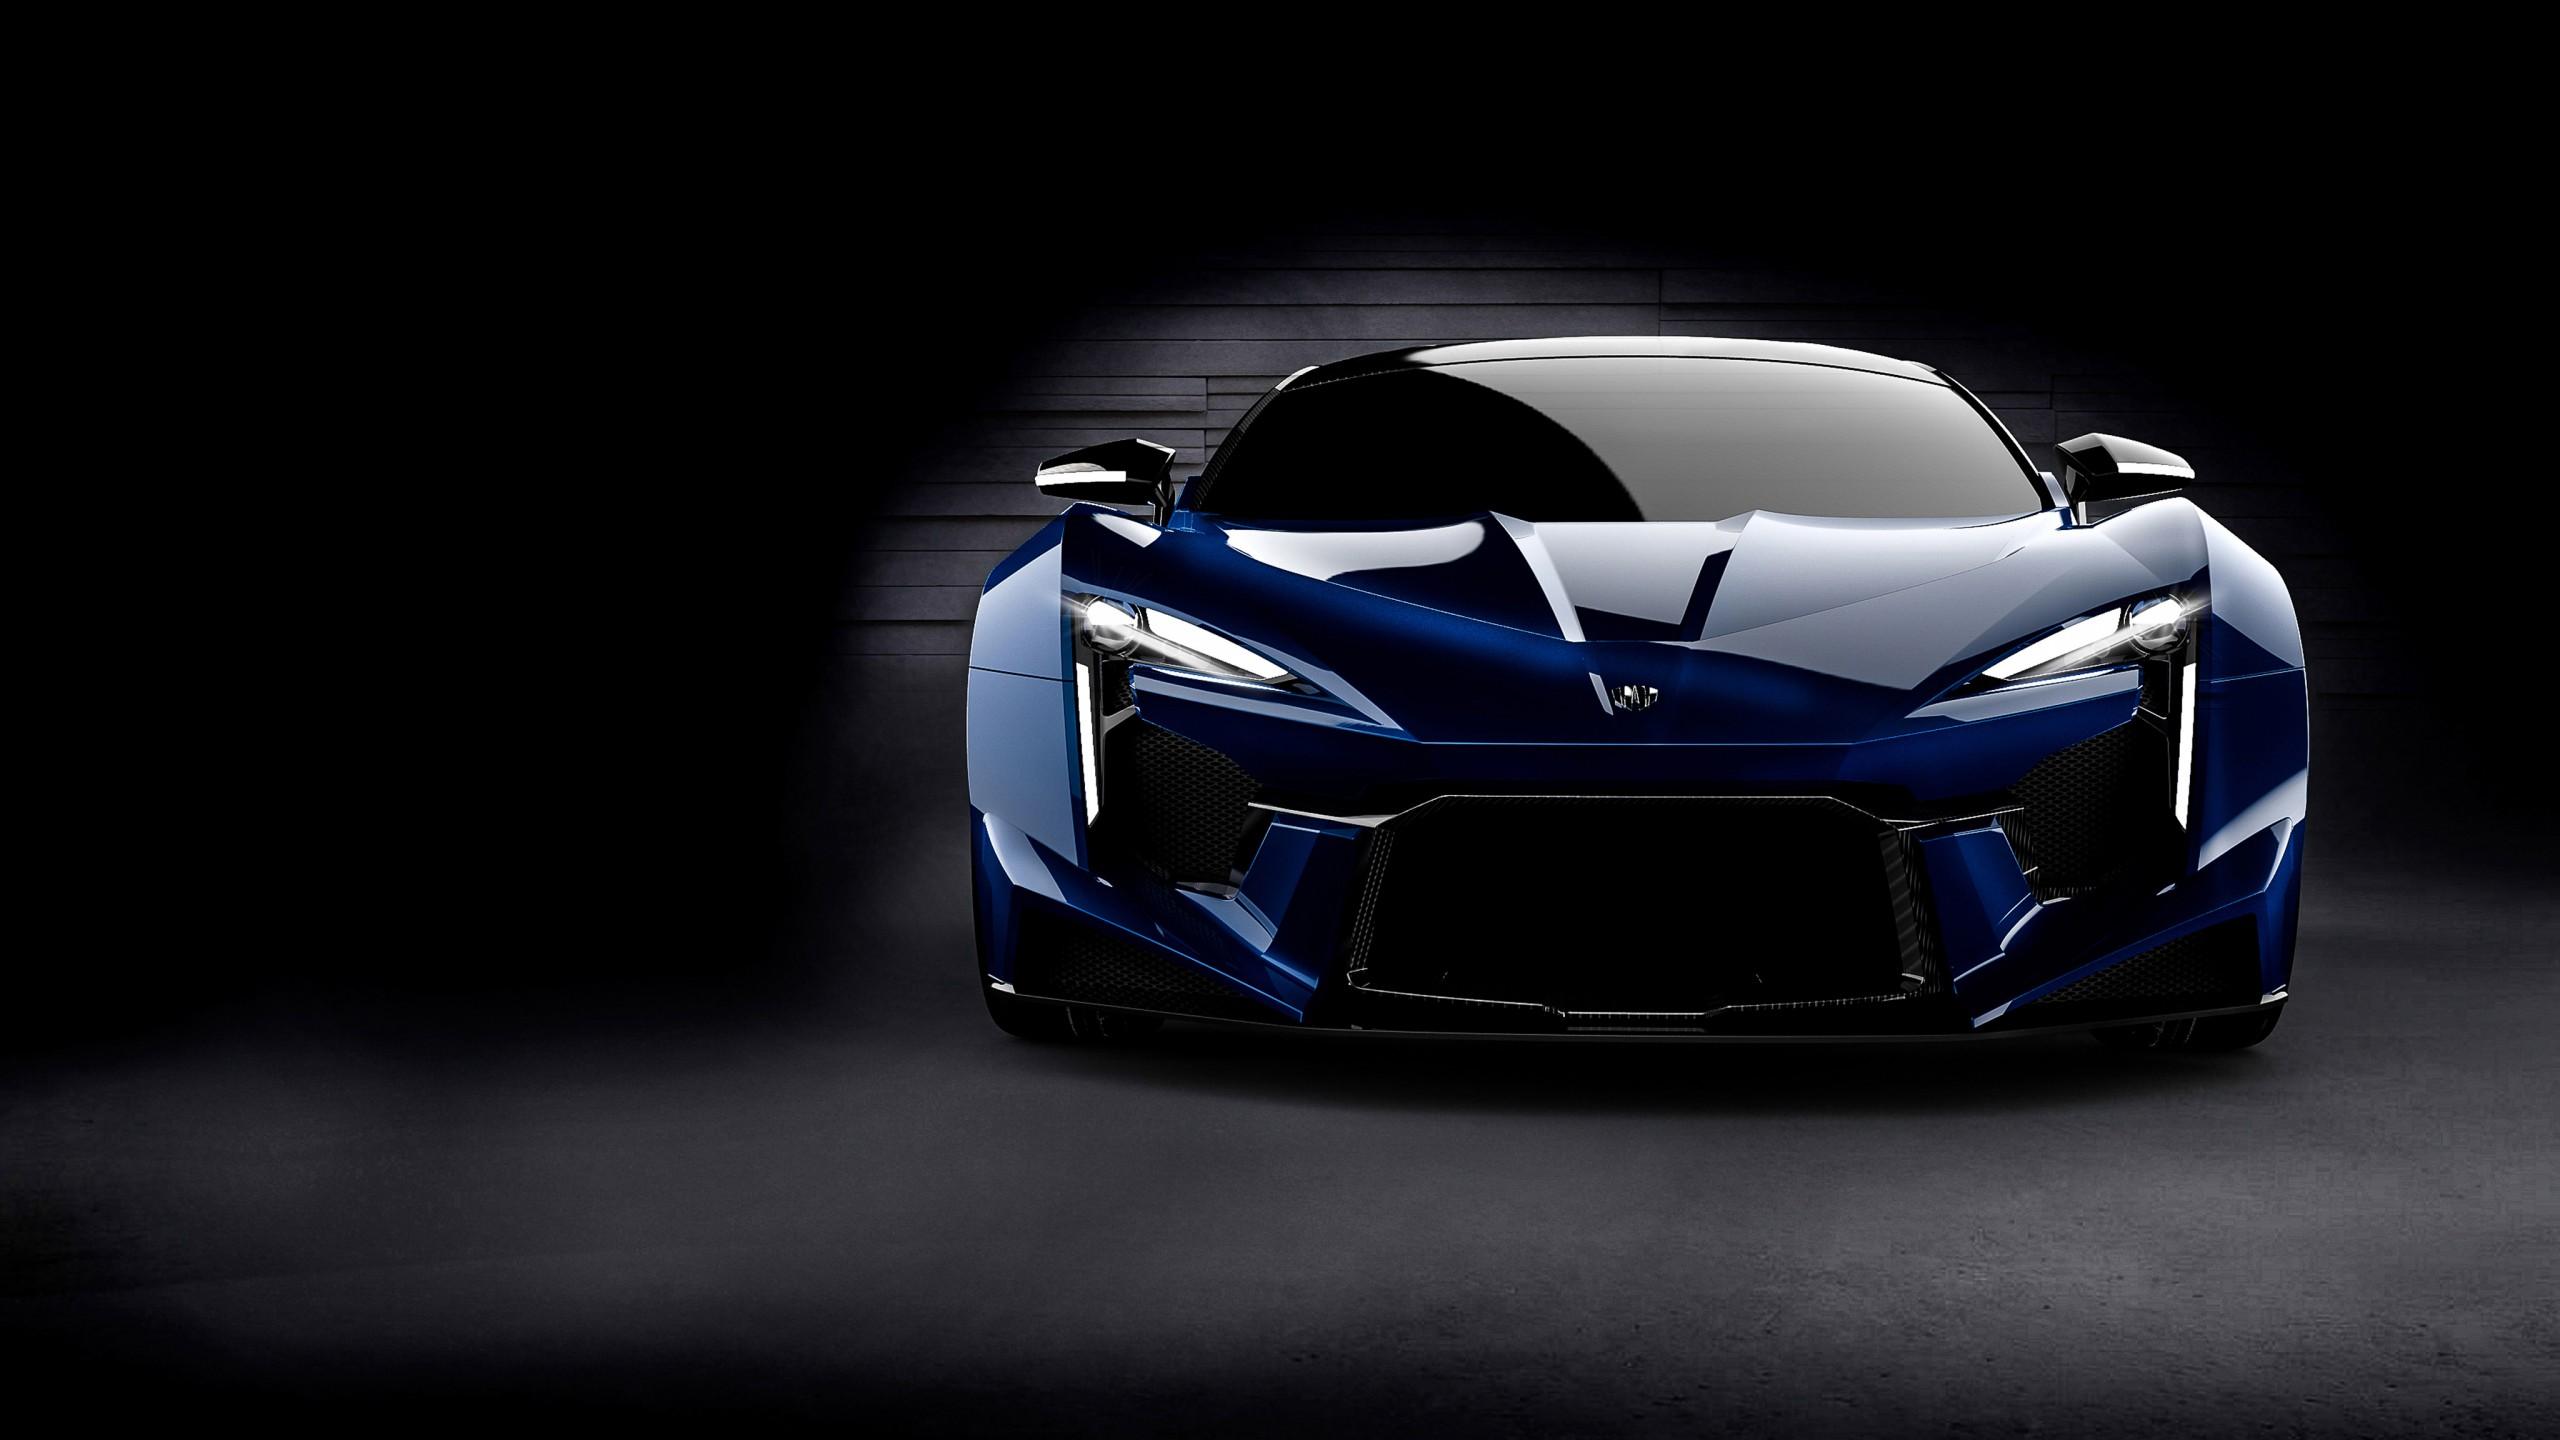 2016 W Motors Fenyr SuperSport Wallpaper | HD Car ...